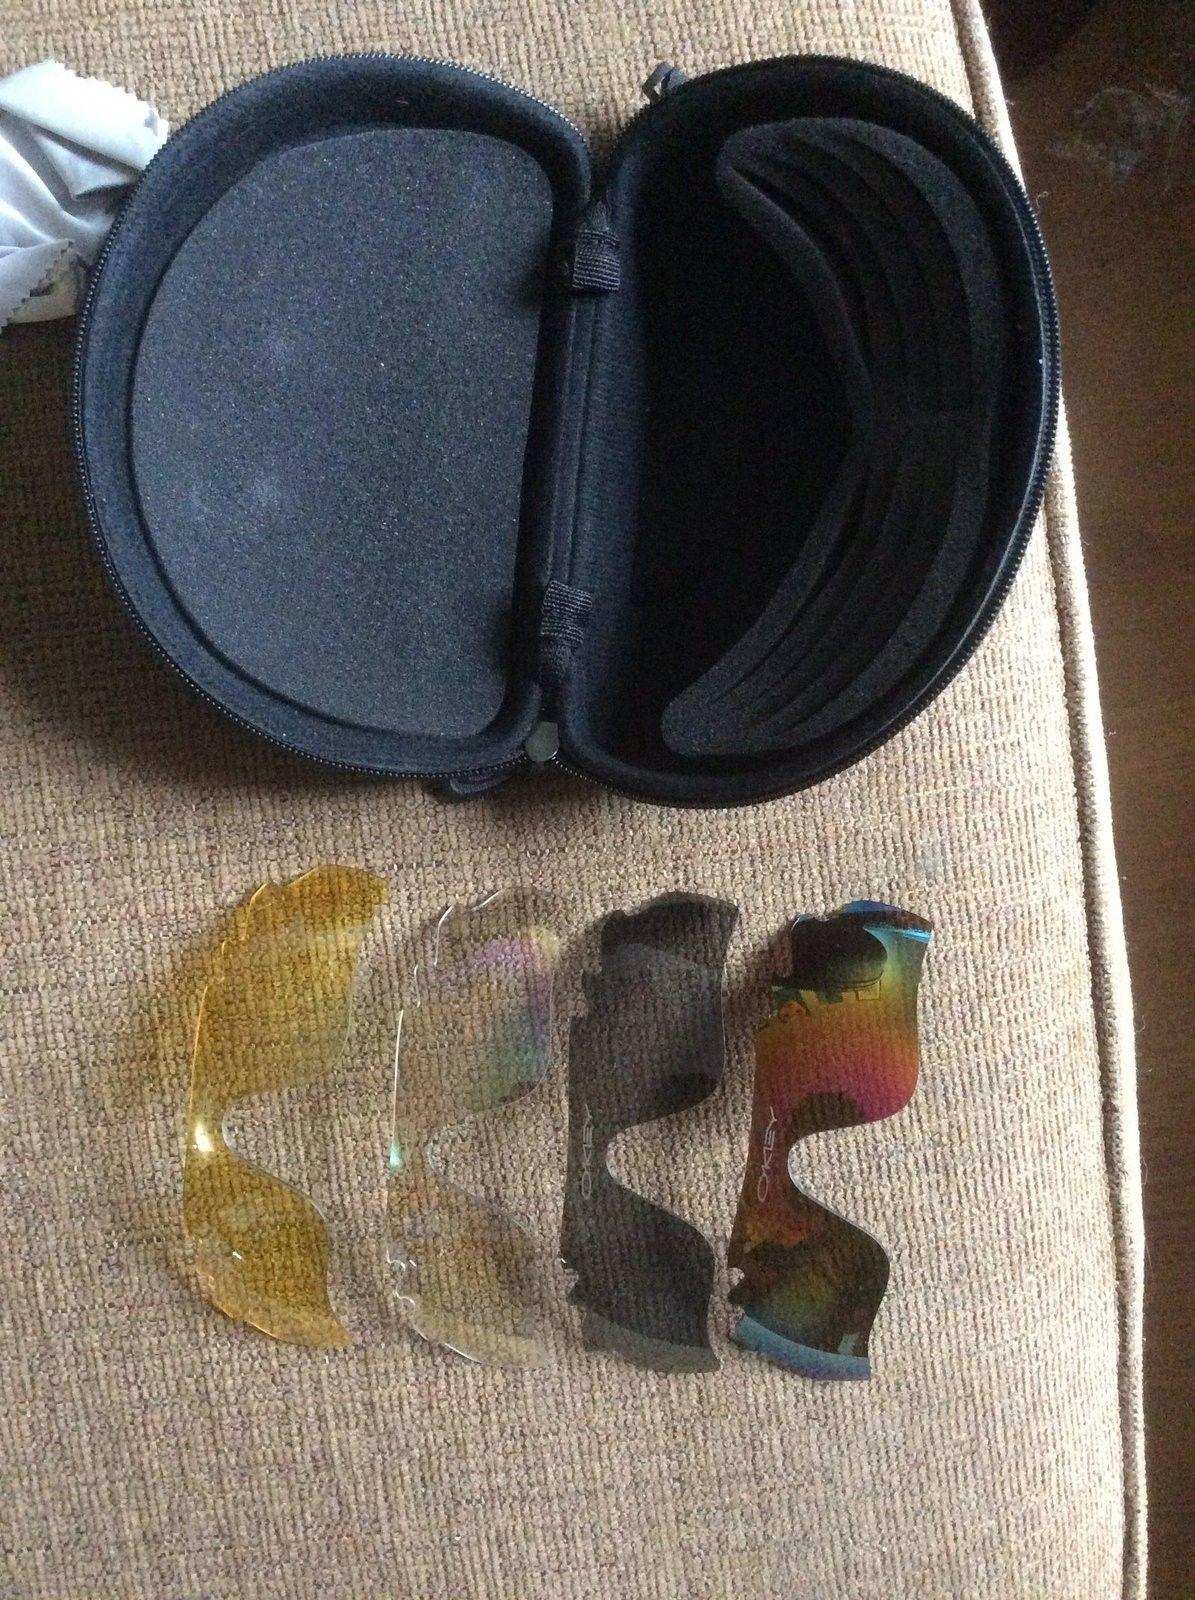 Help ID these lenses - image.jpg